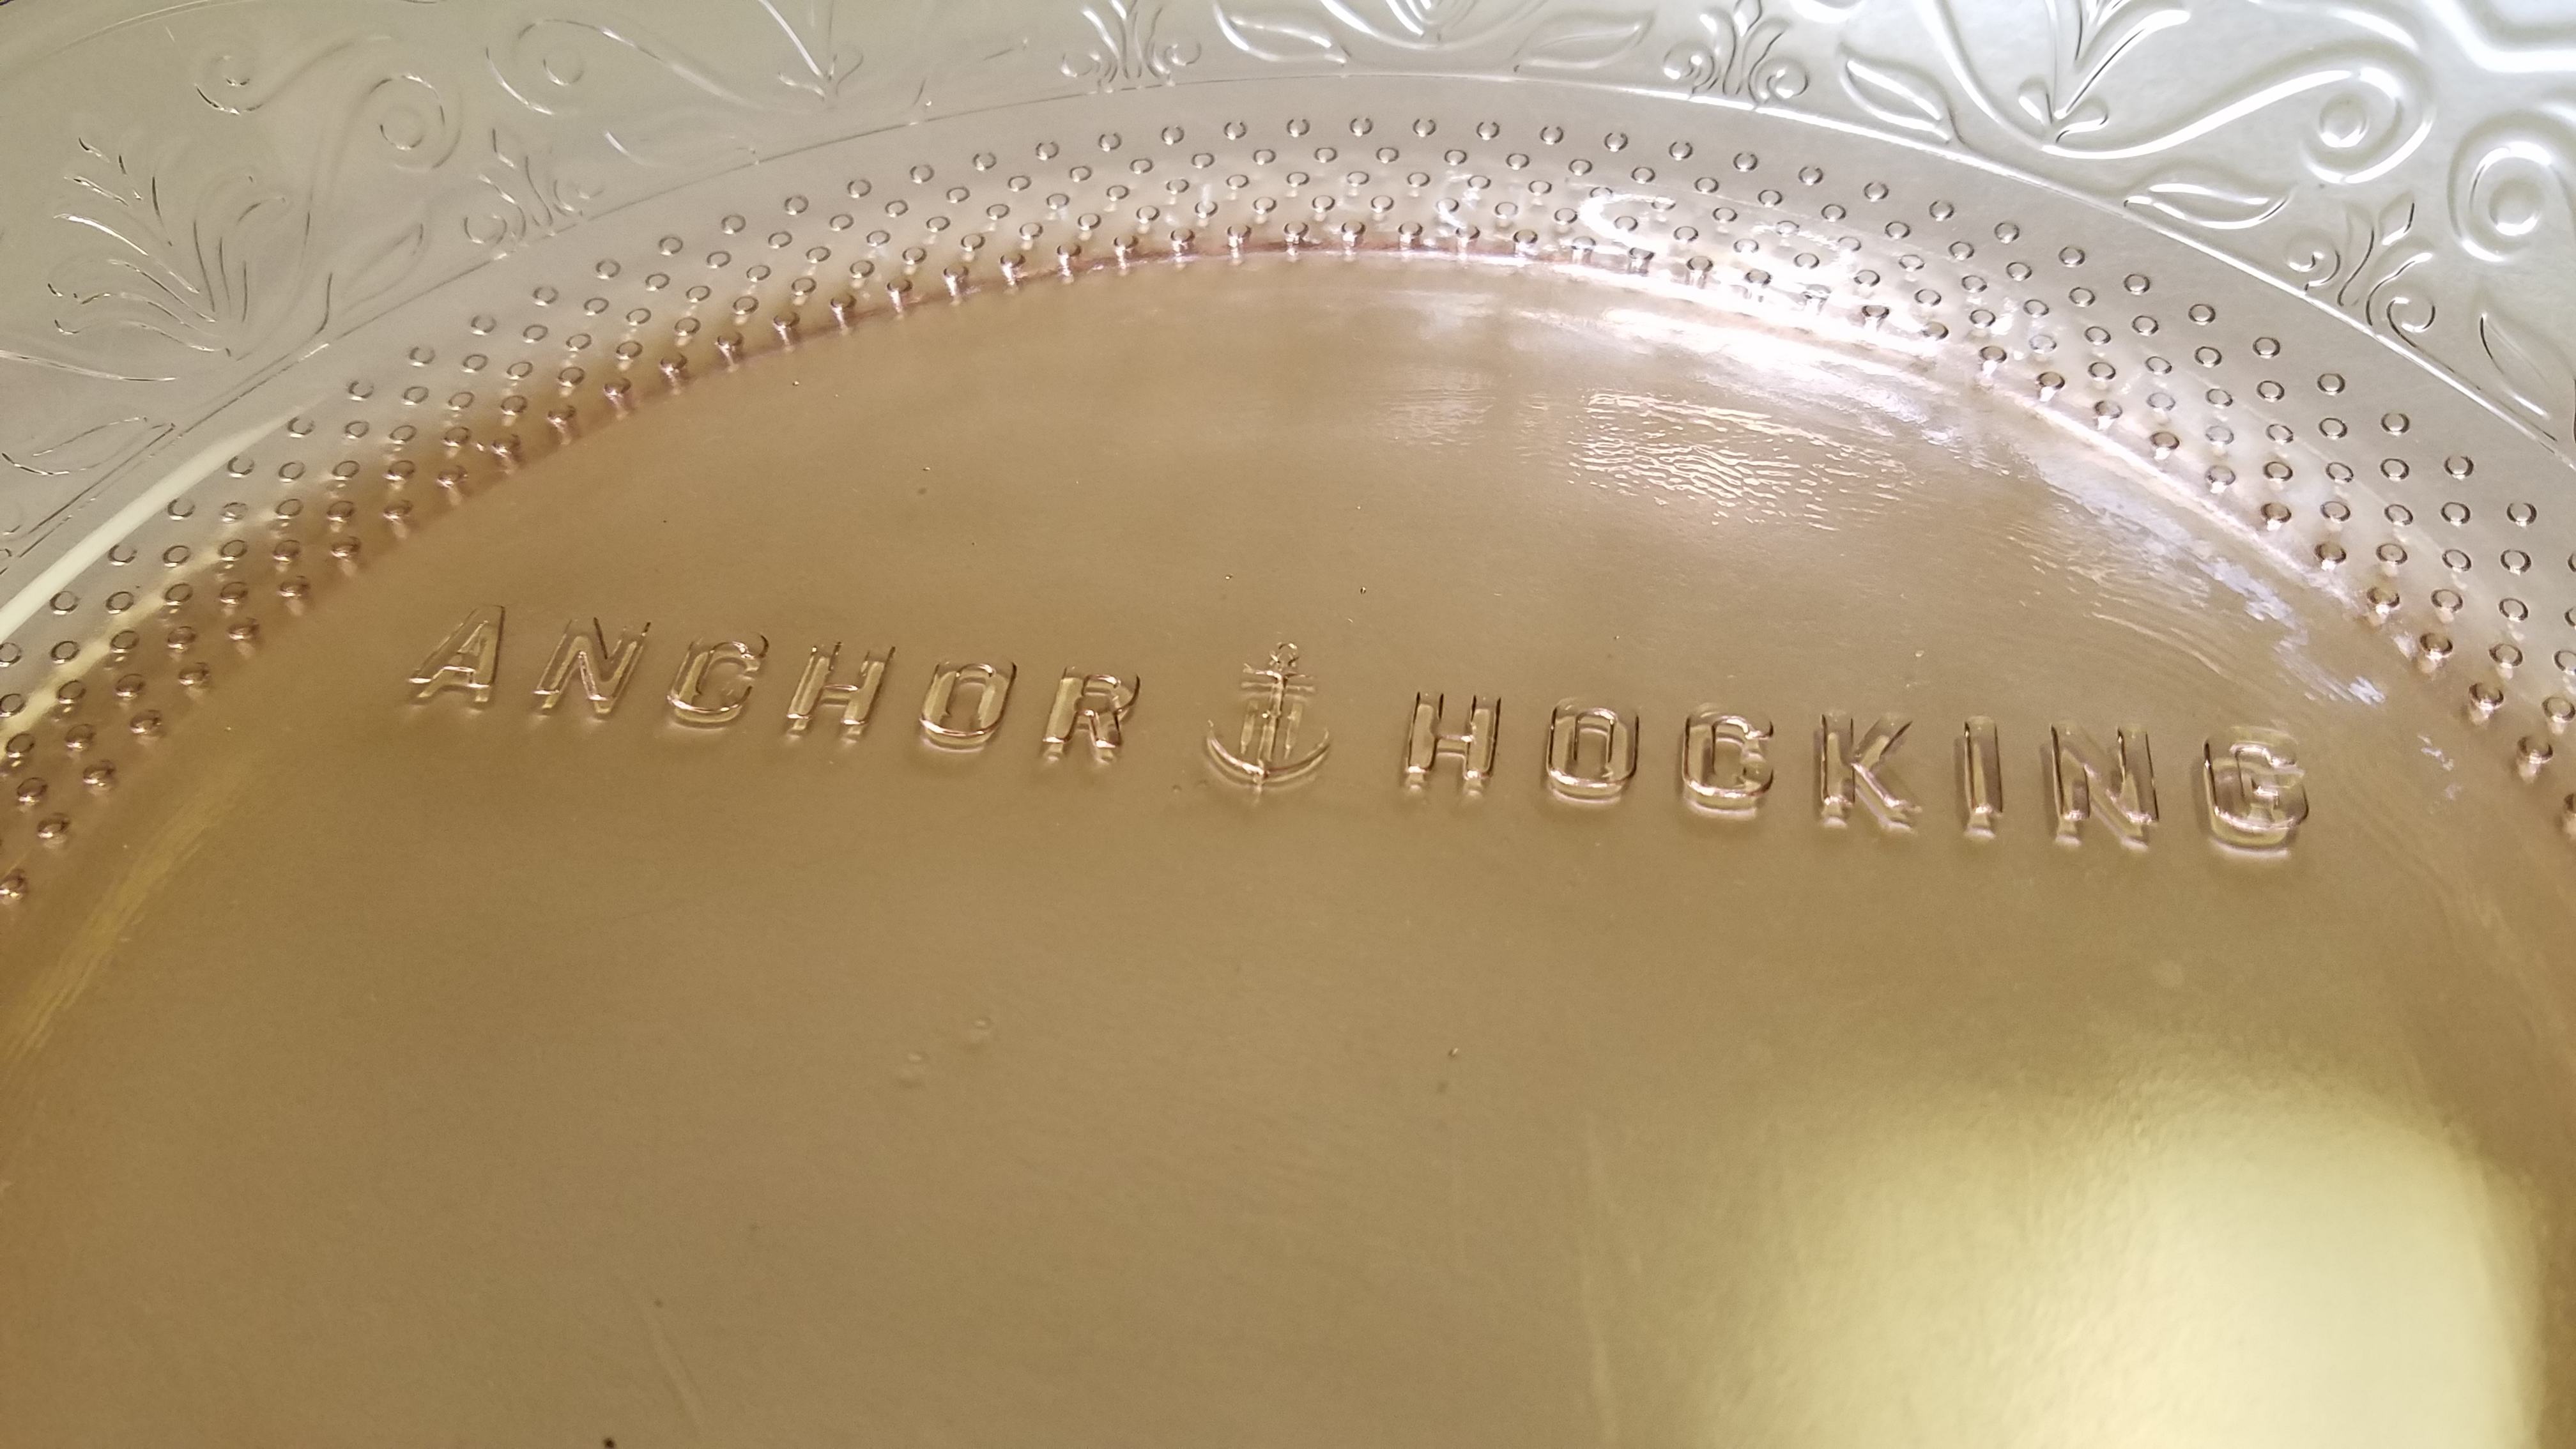 Anchor Hocking glassware, Glass, Glassware, Lancaster, Ocean, HQ Photo